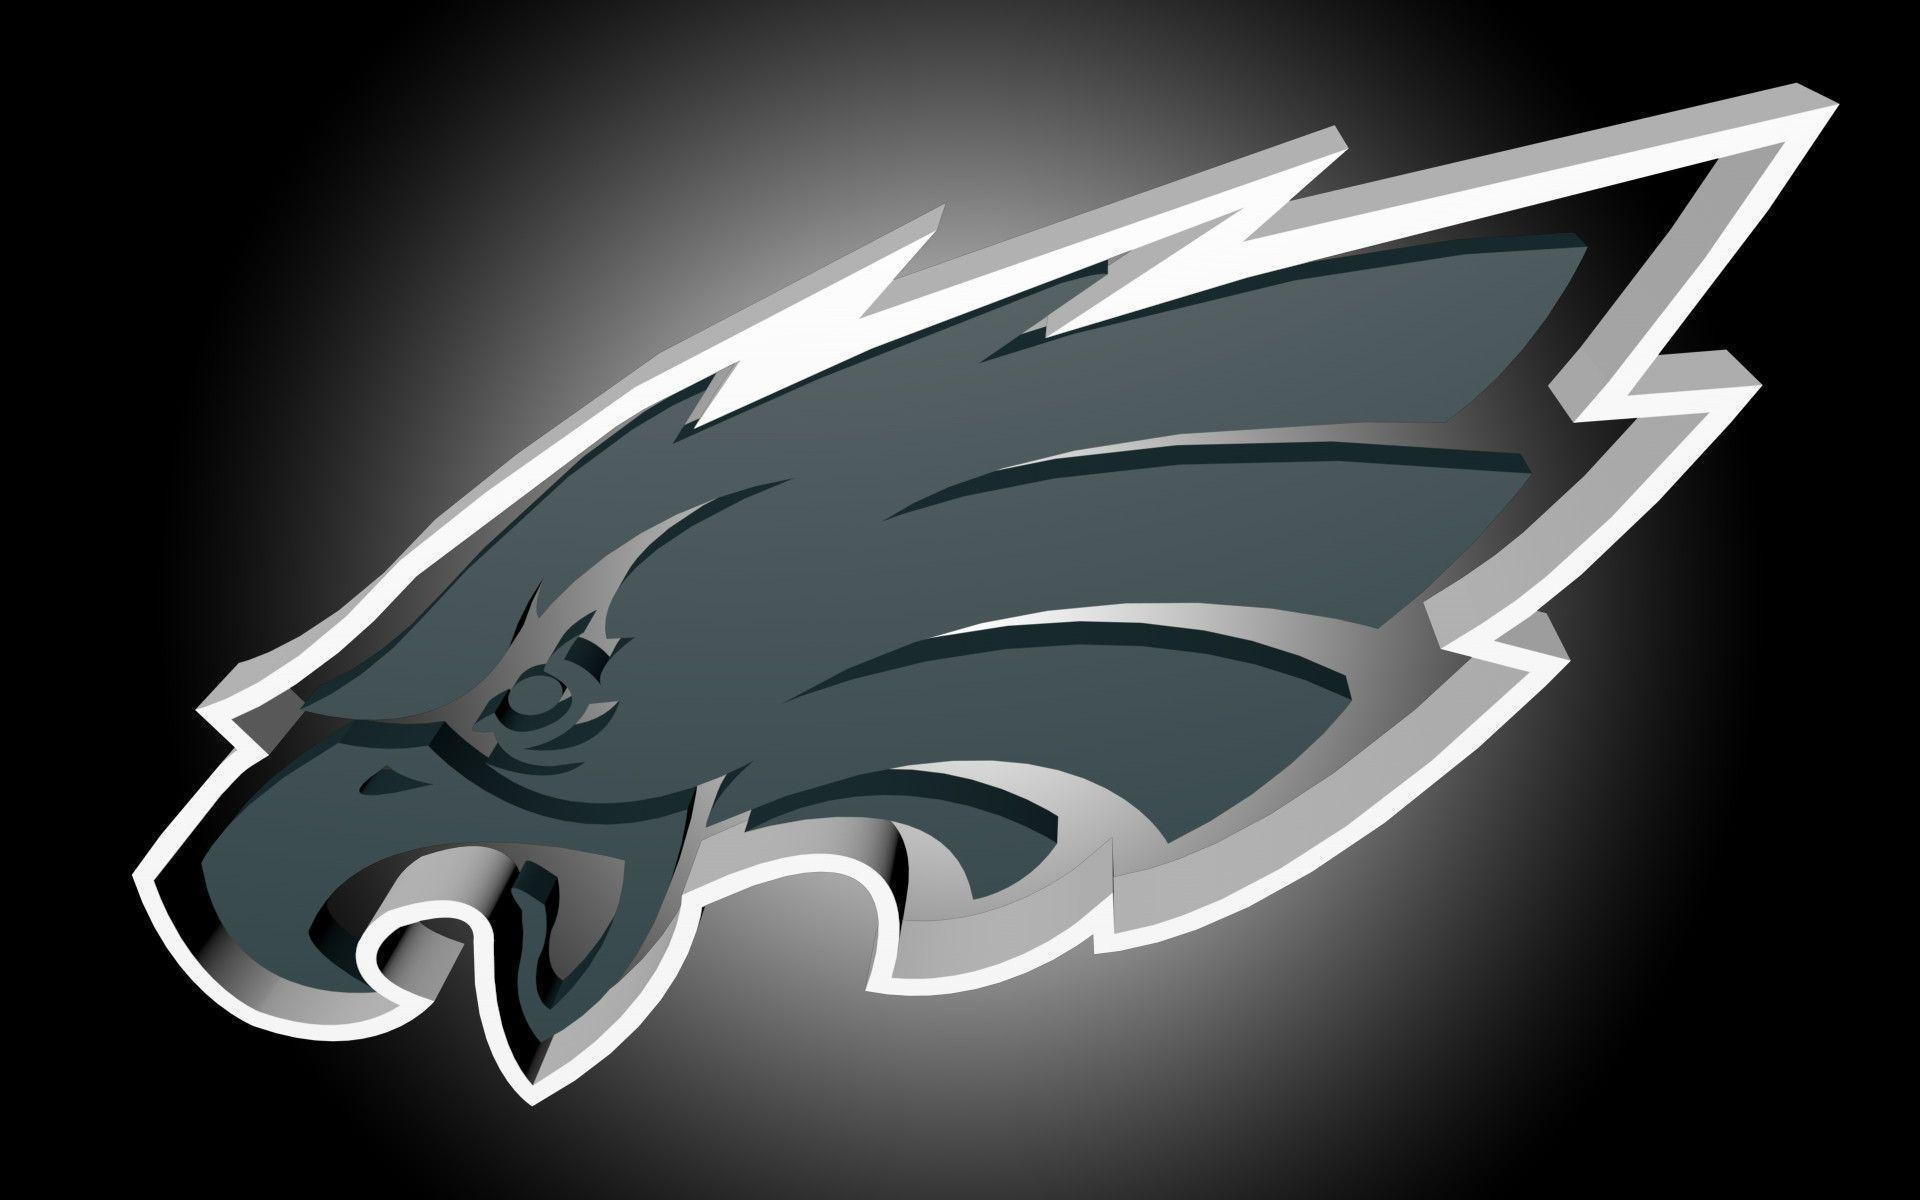 Philadelphia Eagles Wallpapers – Full HD wallpaper search